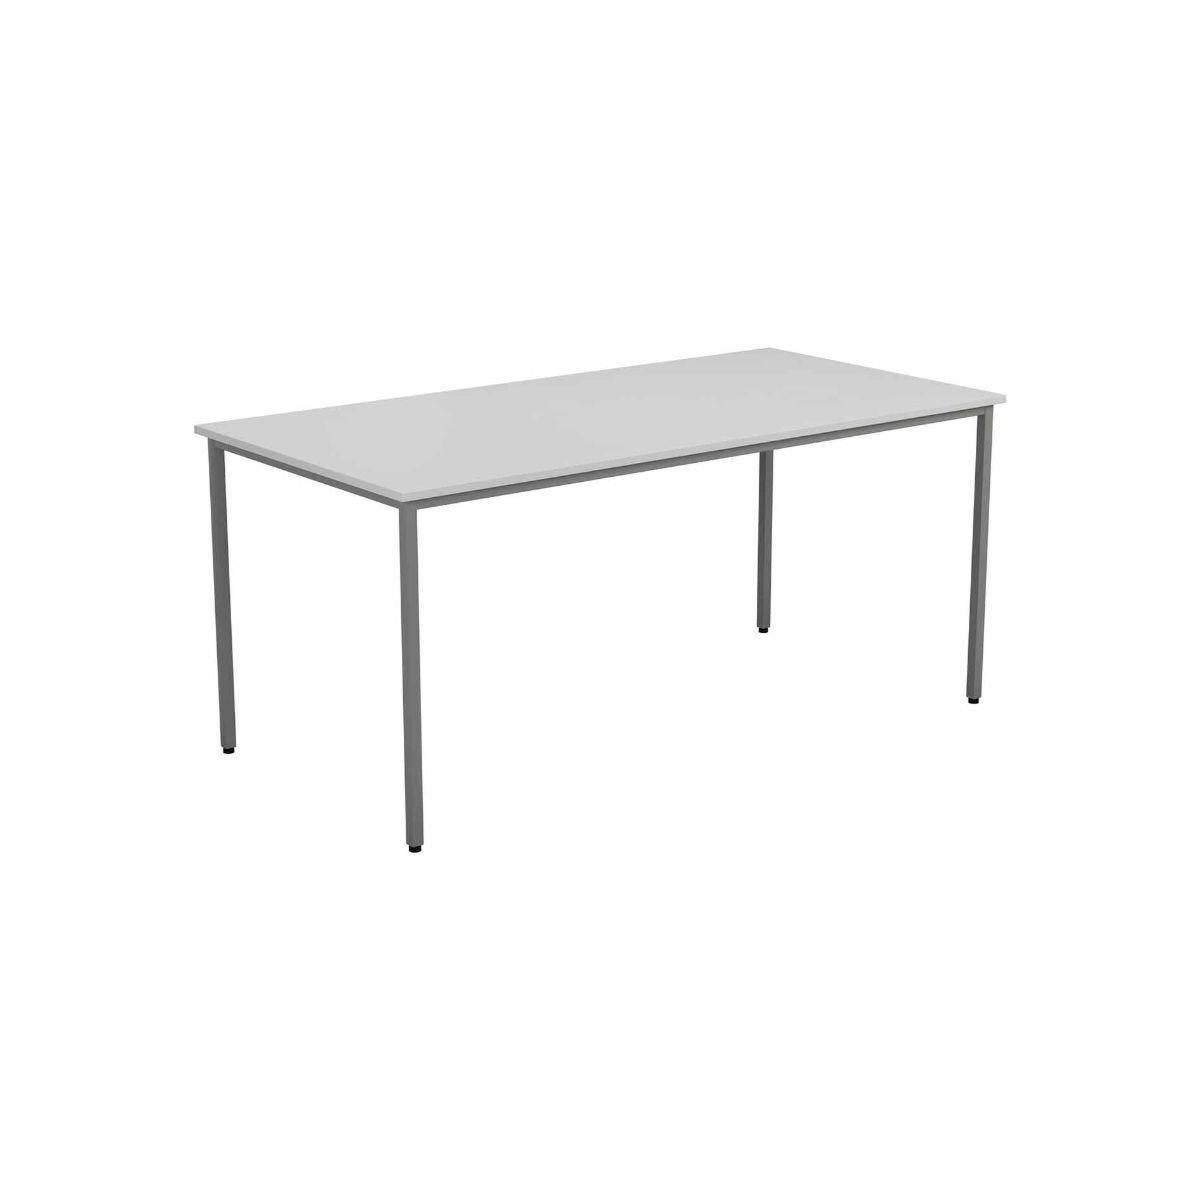 TC Office Rectangular Table 1200 x 800mm White